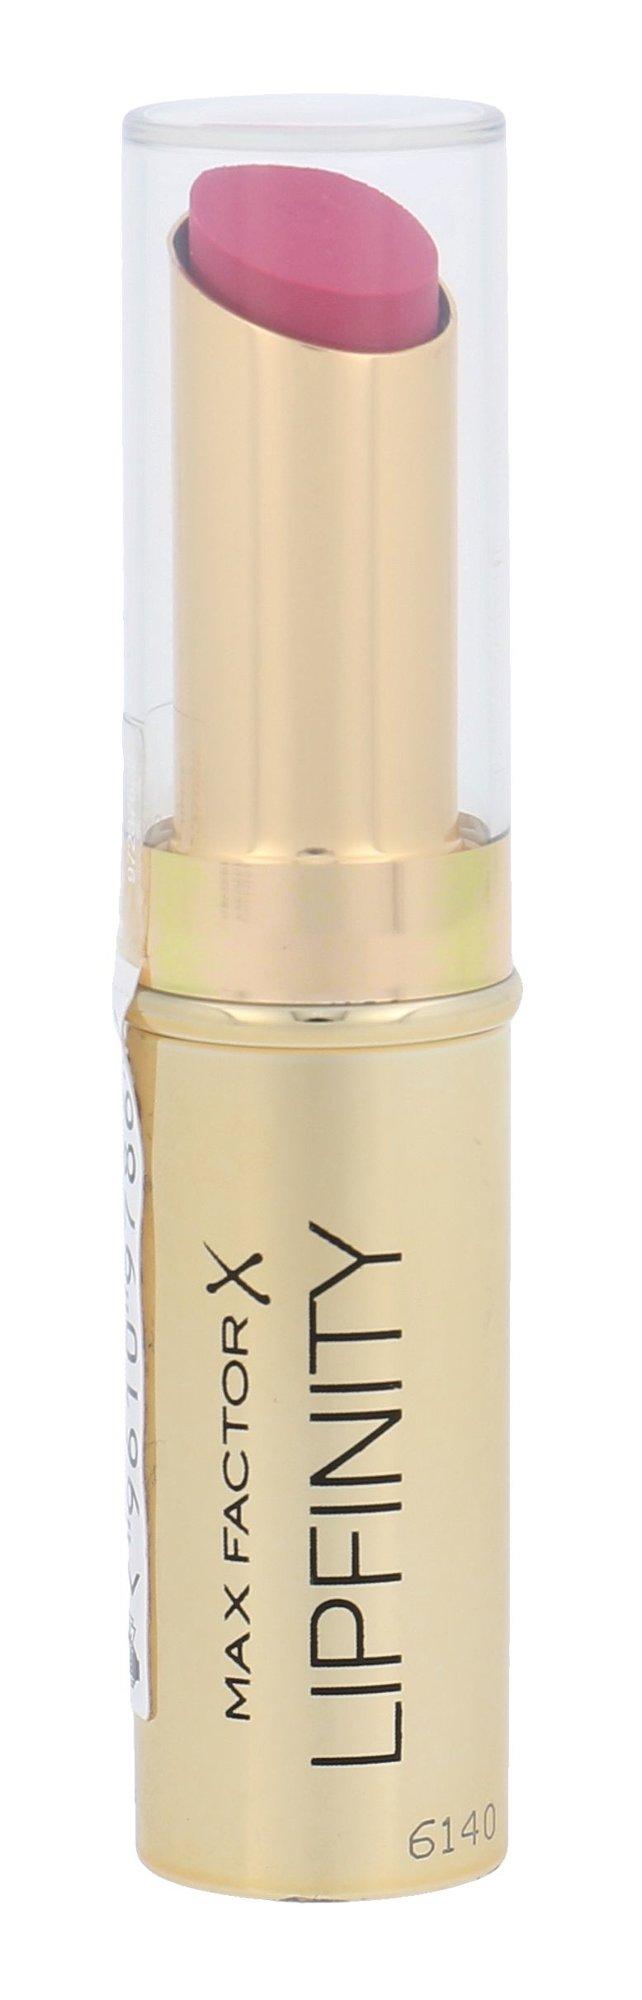 Max Factor Lipfinity Cosmetic 3,4ml 50 Just Alluring